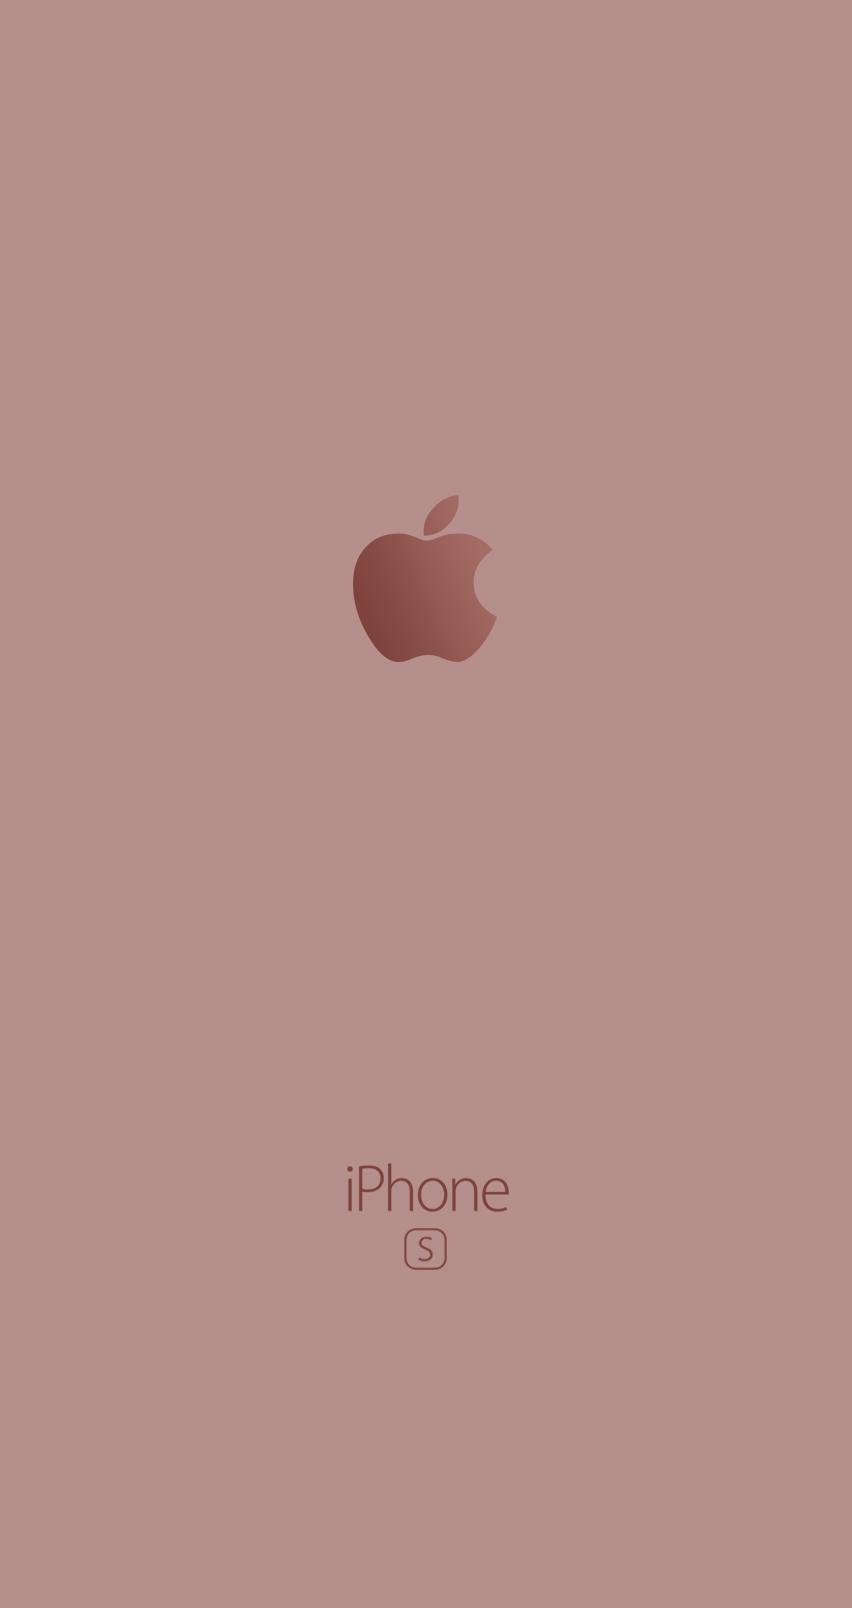 Iphone 6s Wallpaper Pink Logo Apple Fond D Ecran Rose Wallpapers Wallpaper Apel Wallpaper Ponsel Kertas Dinding